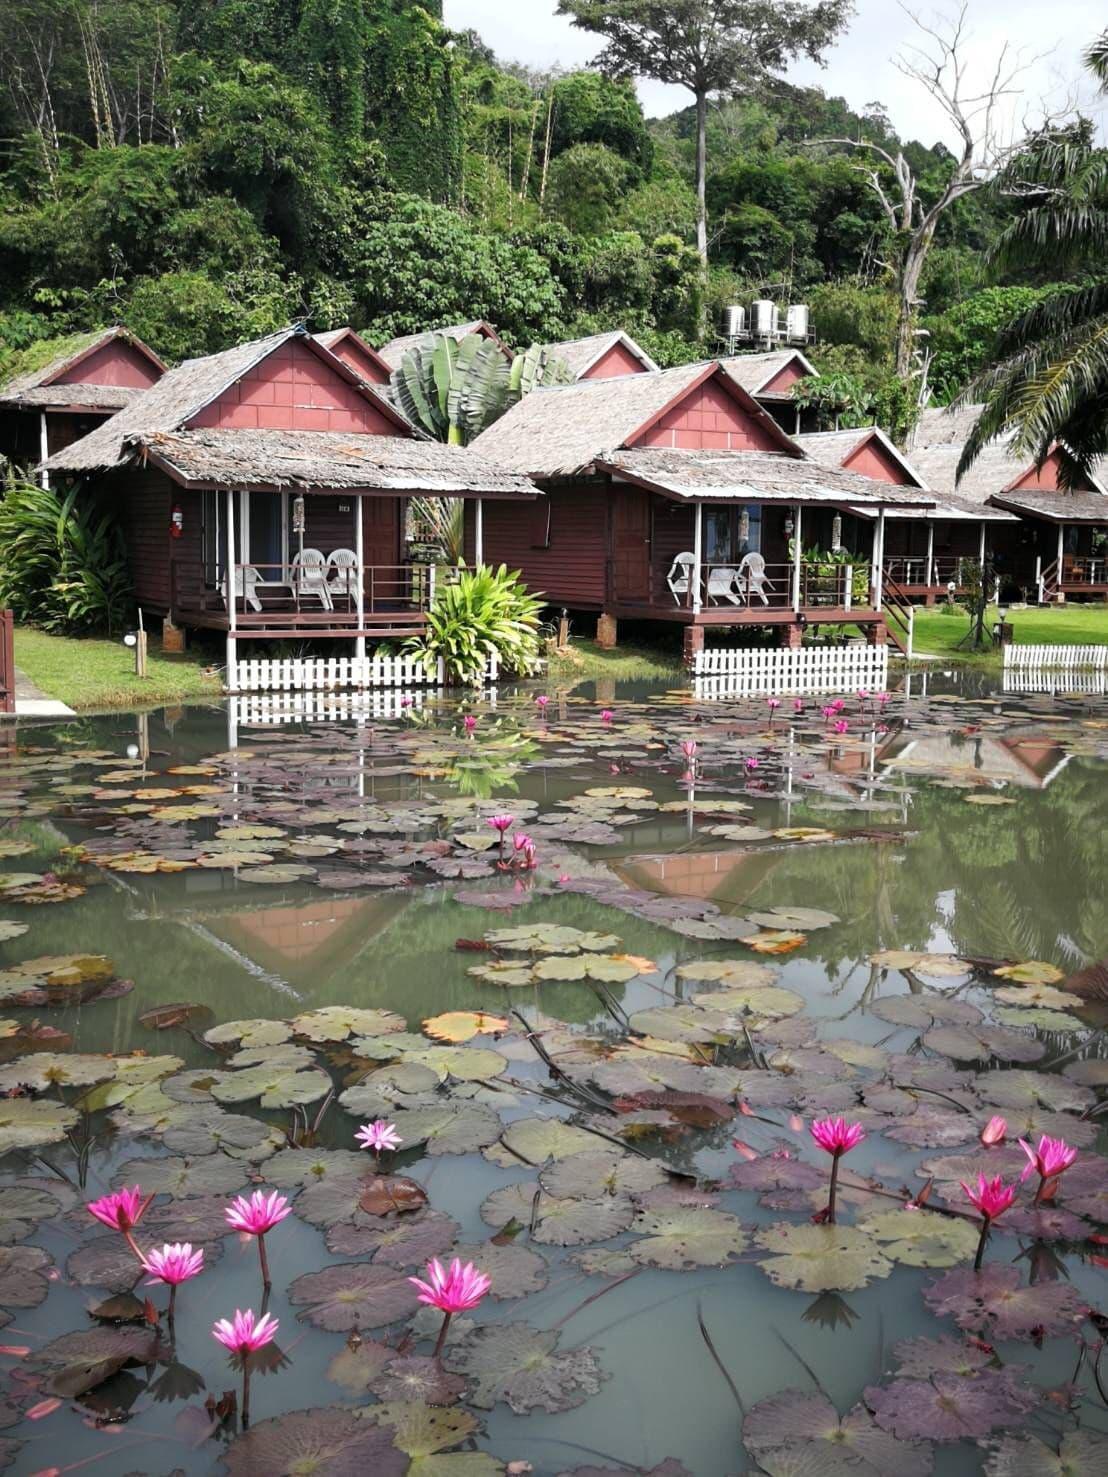 Holiday Resort Koh Yao Noi ฮอลิเดย์ รีสอร์ต เกาะยาวน้อย